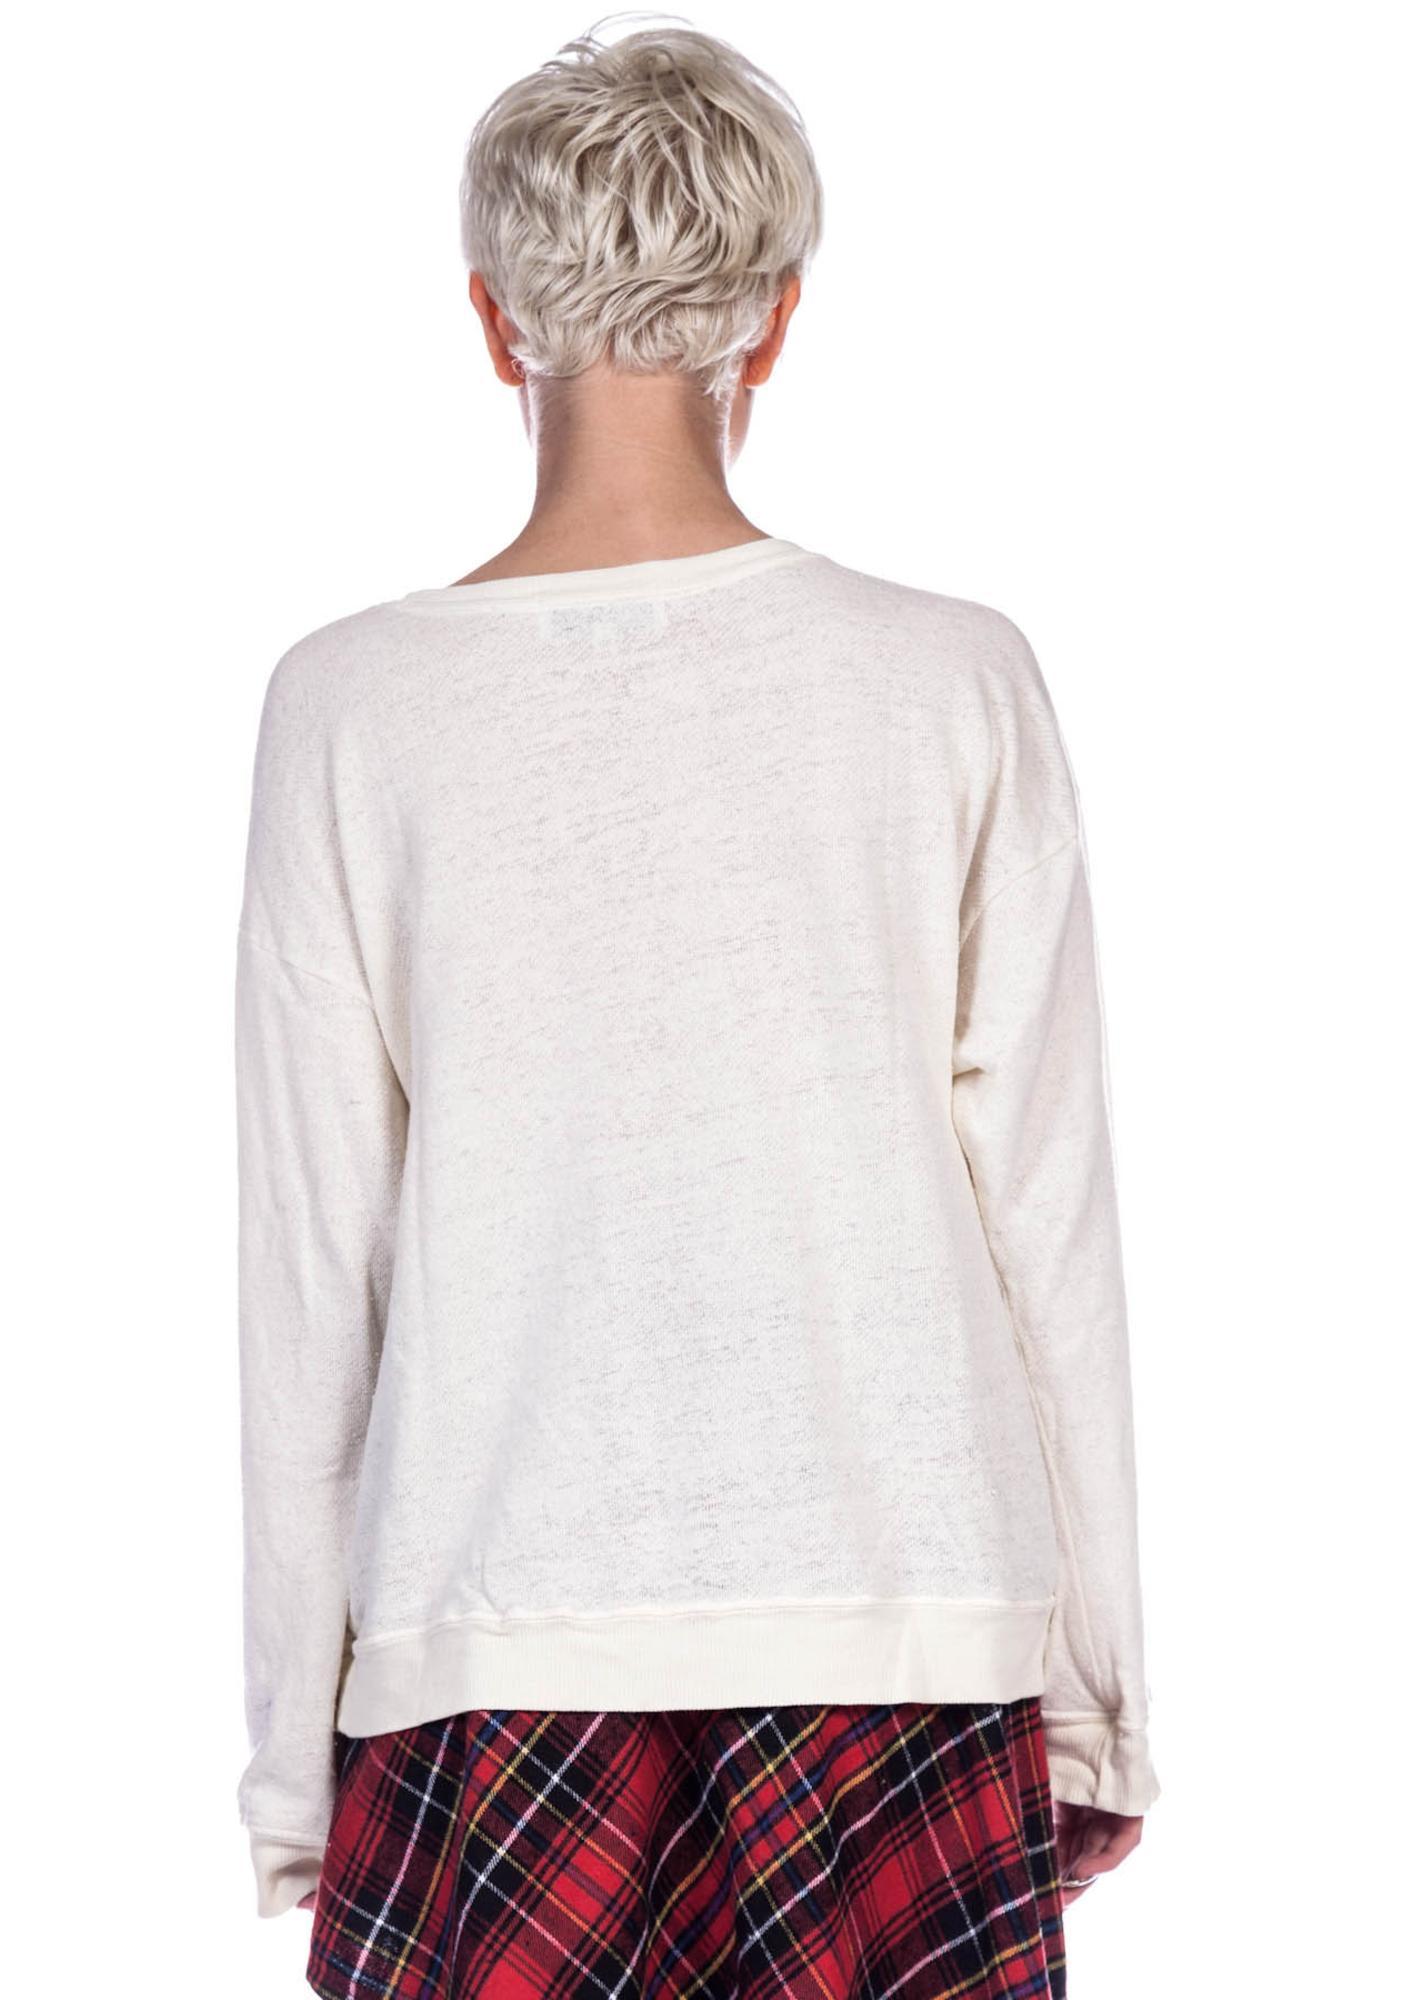 Wildfox Couture Famous Oversize Sweatshirt